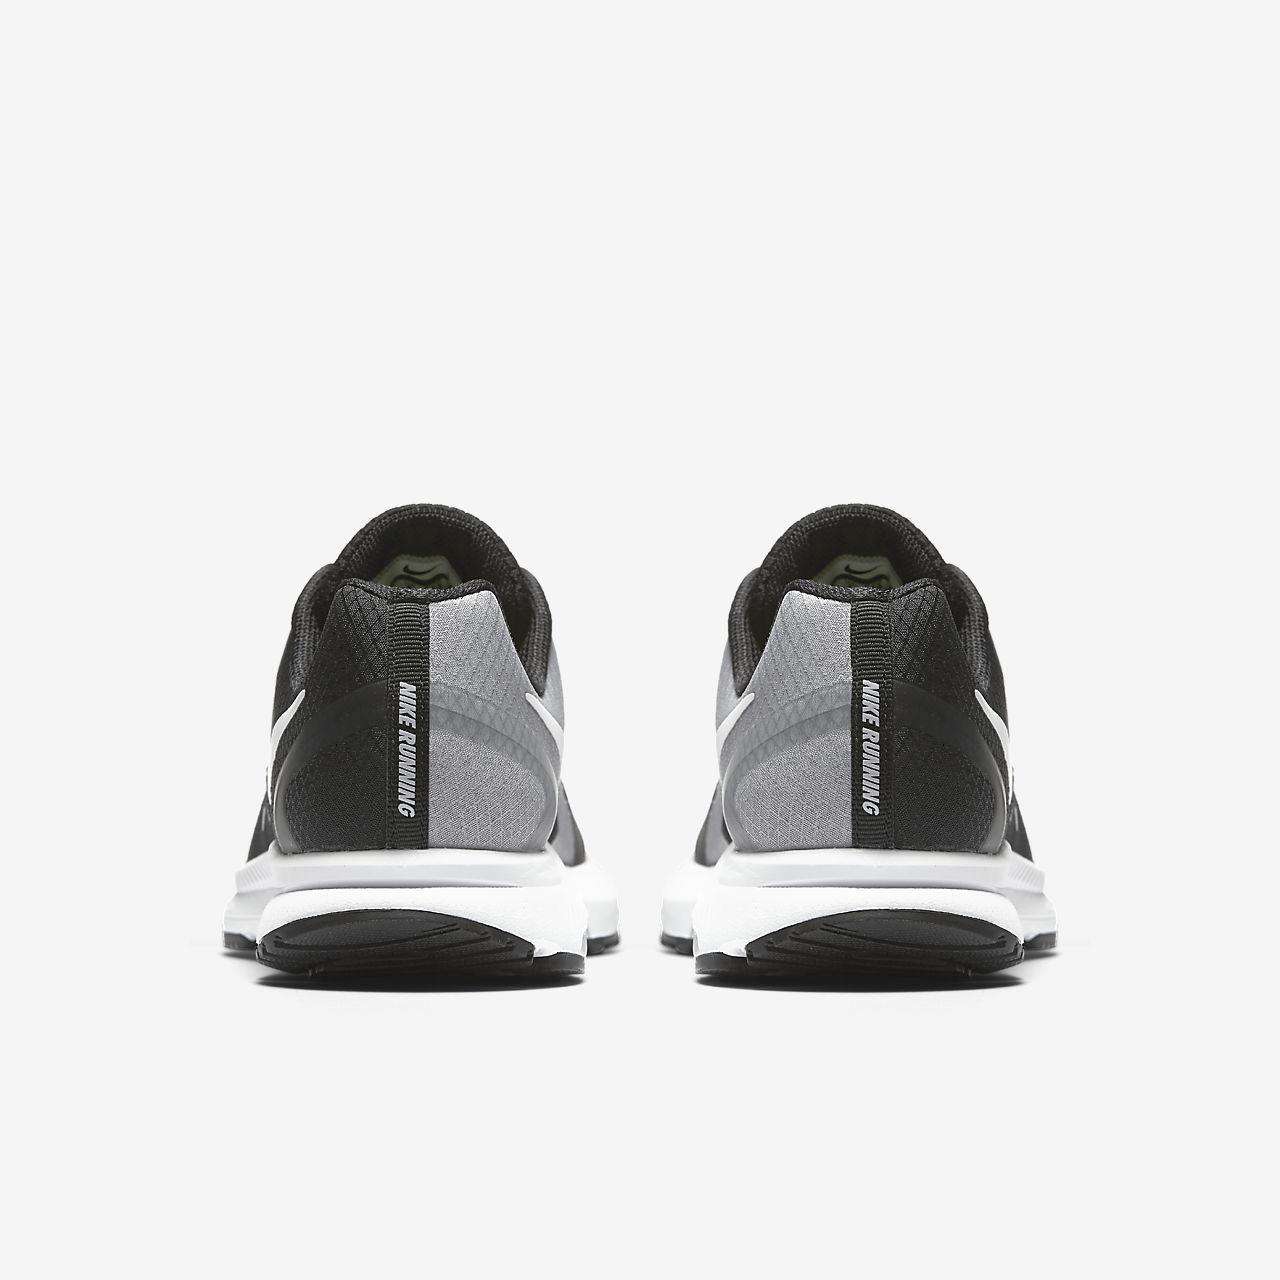 ... Nike Air Zoom Span Women's Running Shoe